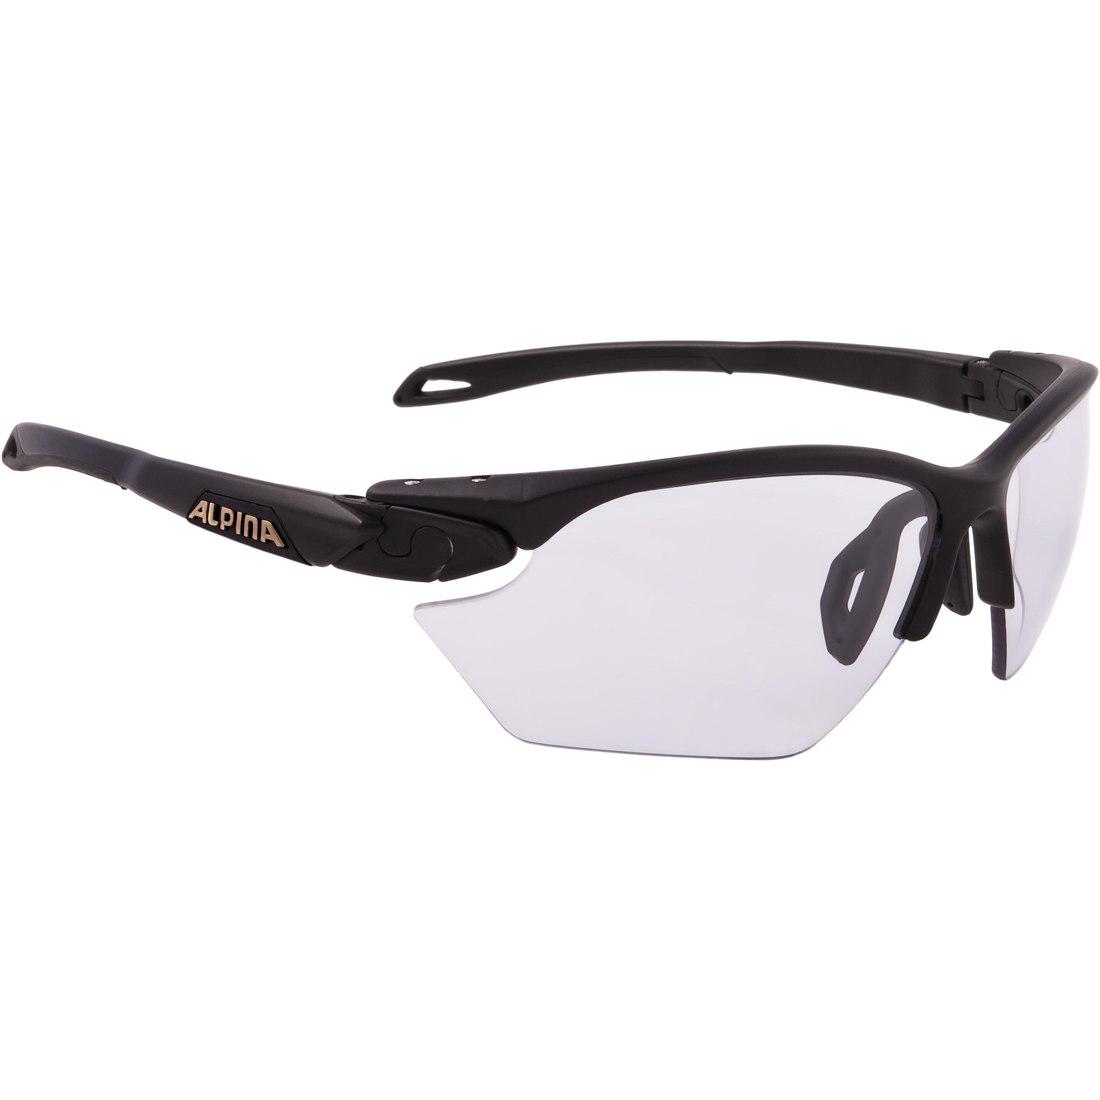 Alpina Twist Five HR S VL+ black matt/Varioflex black - Glasses